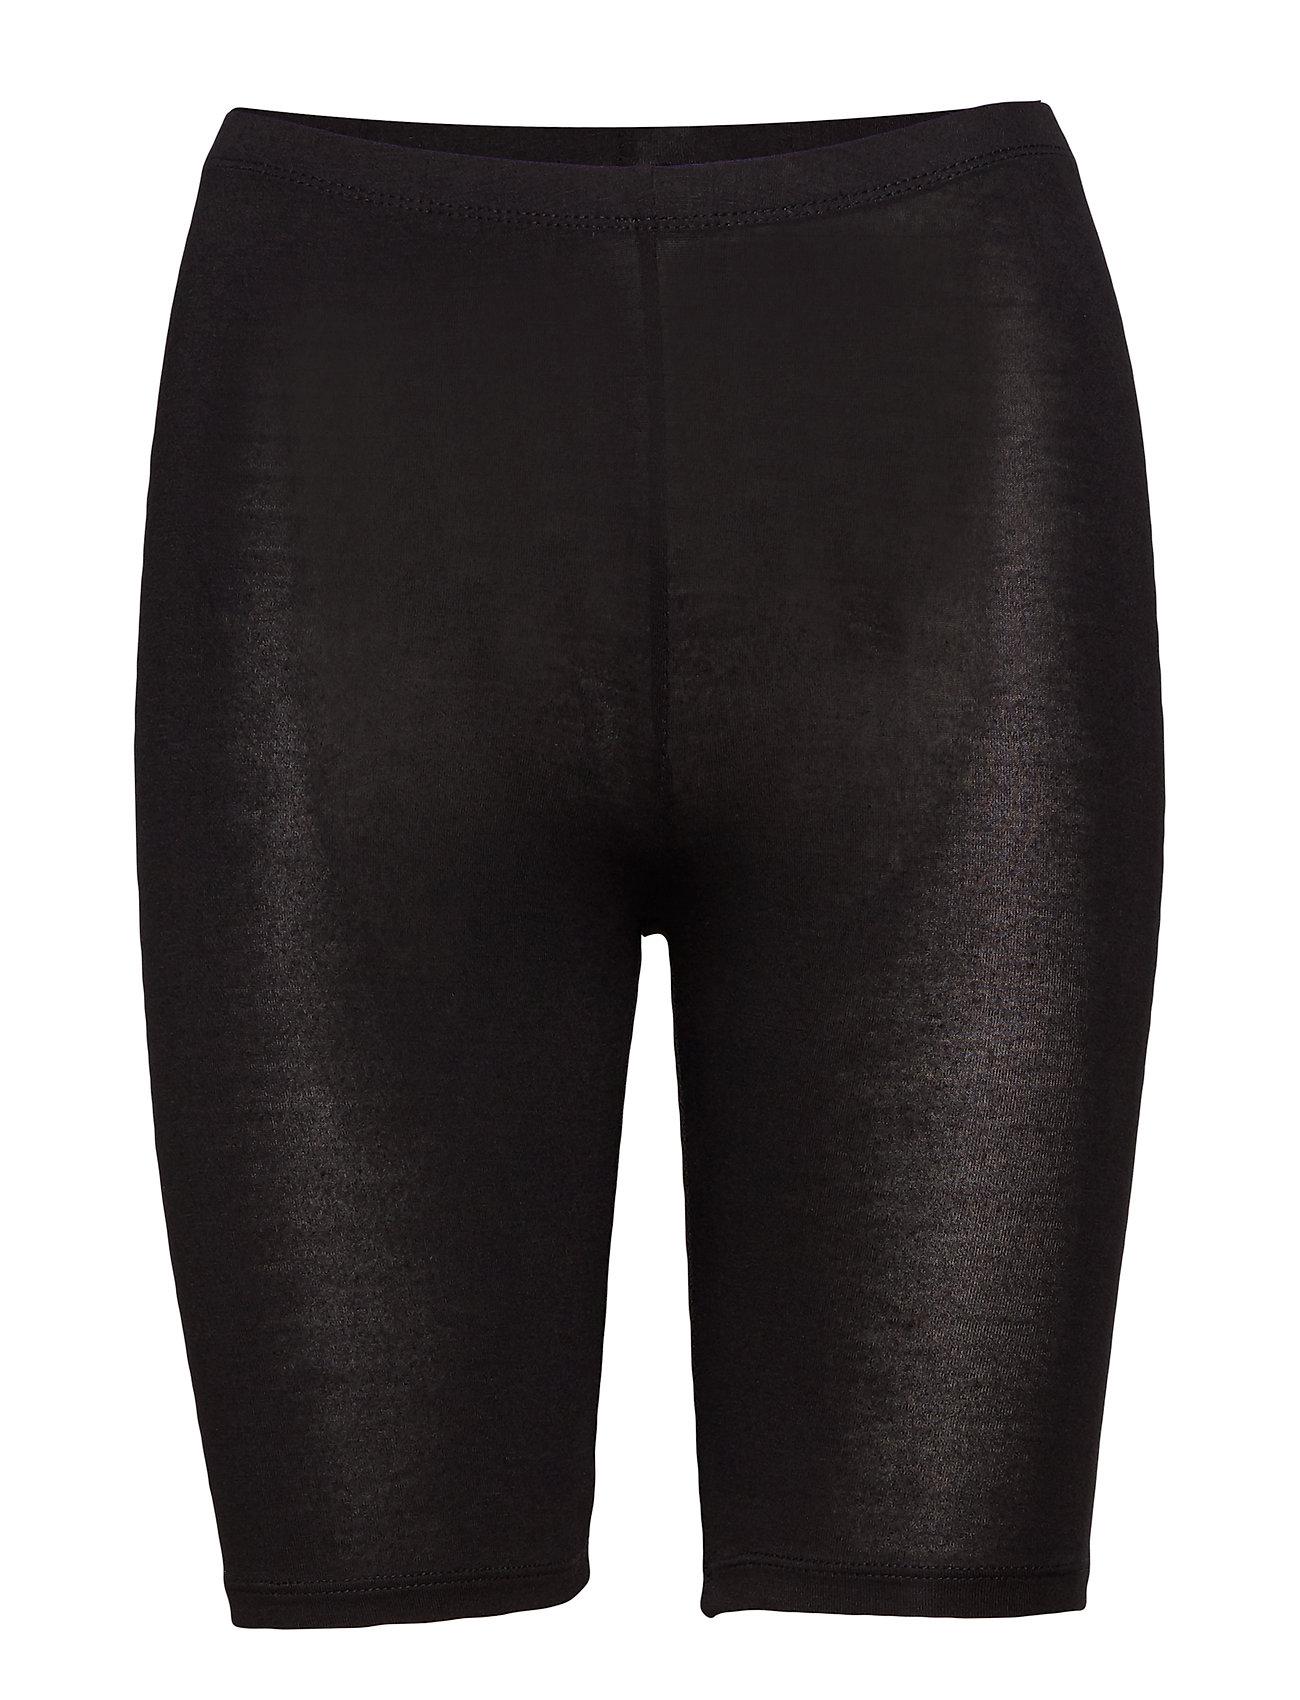 Jersey Stretch Shorts - Decoy